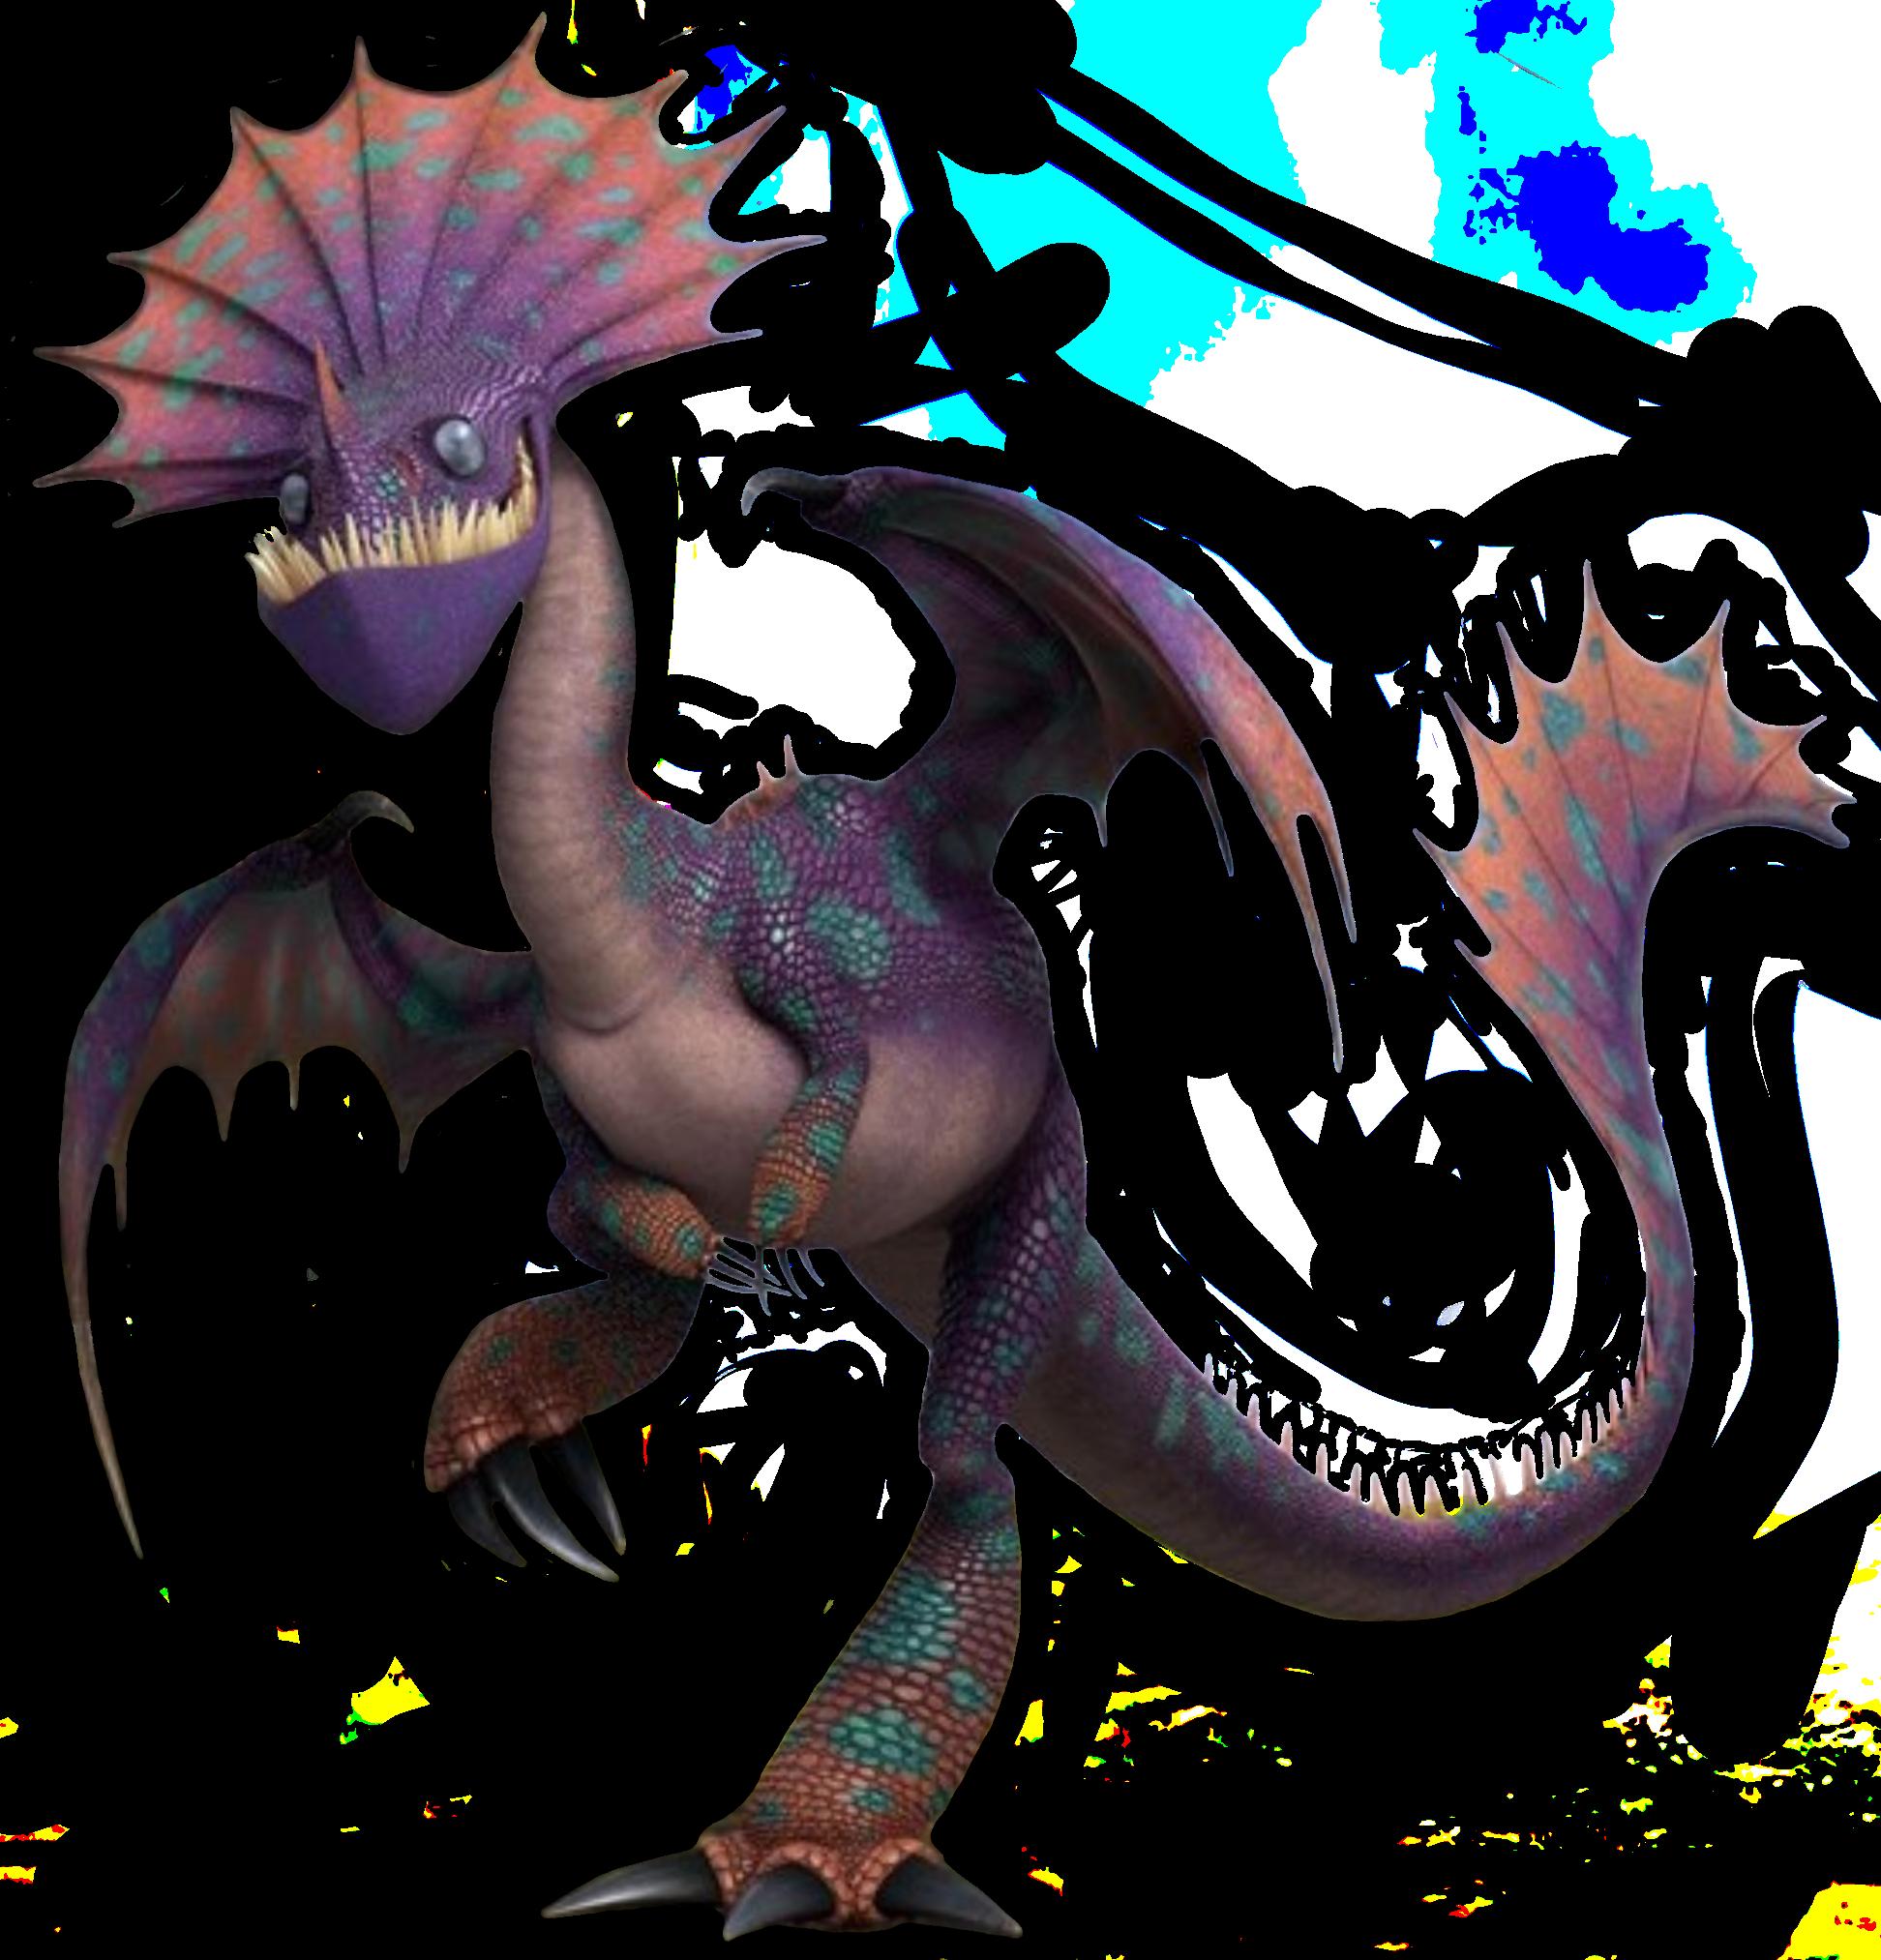 Hobblegrunt How To Train Your Dragon Wiki Fandom